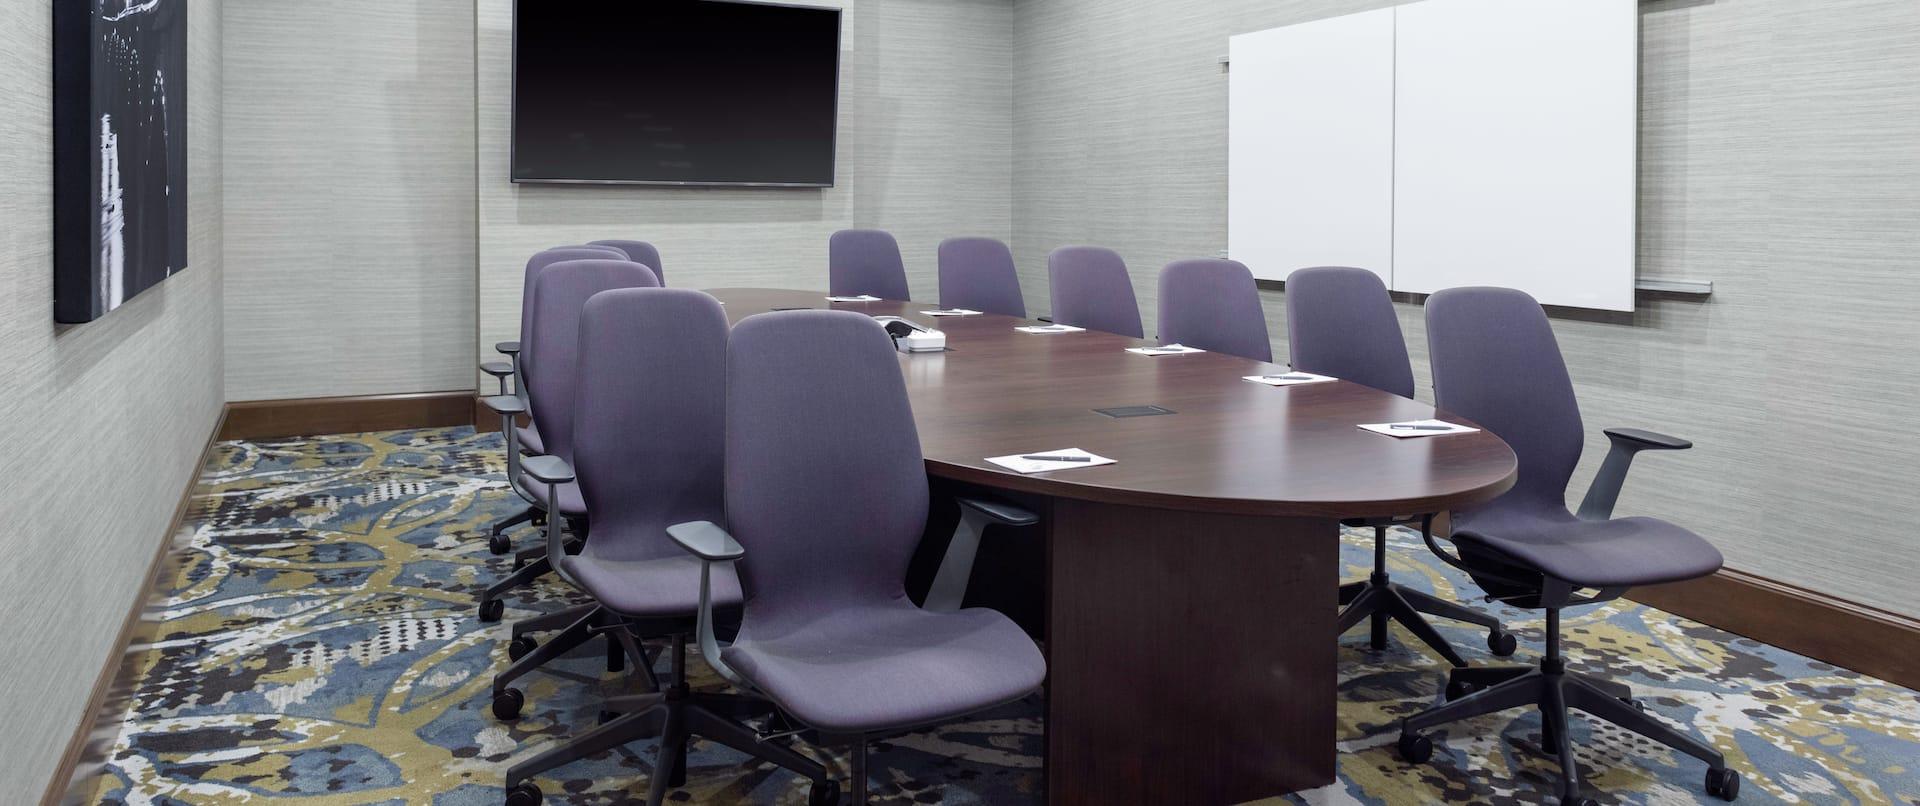 Boardroom Meeting Area